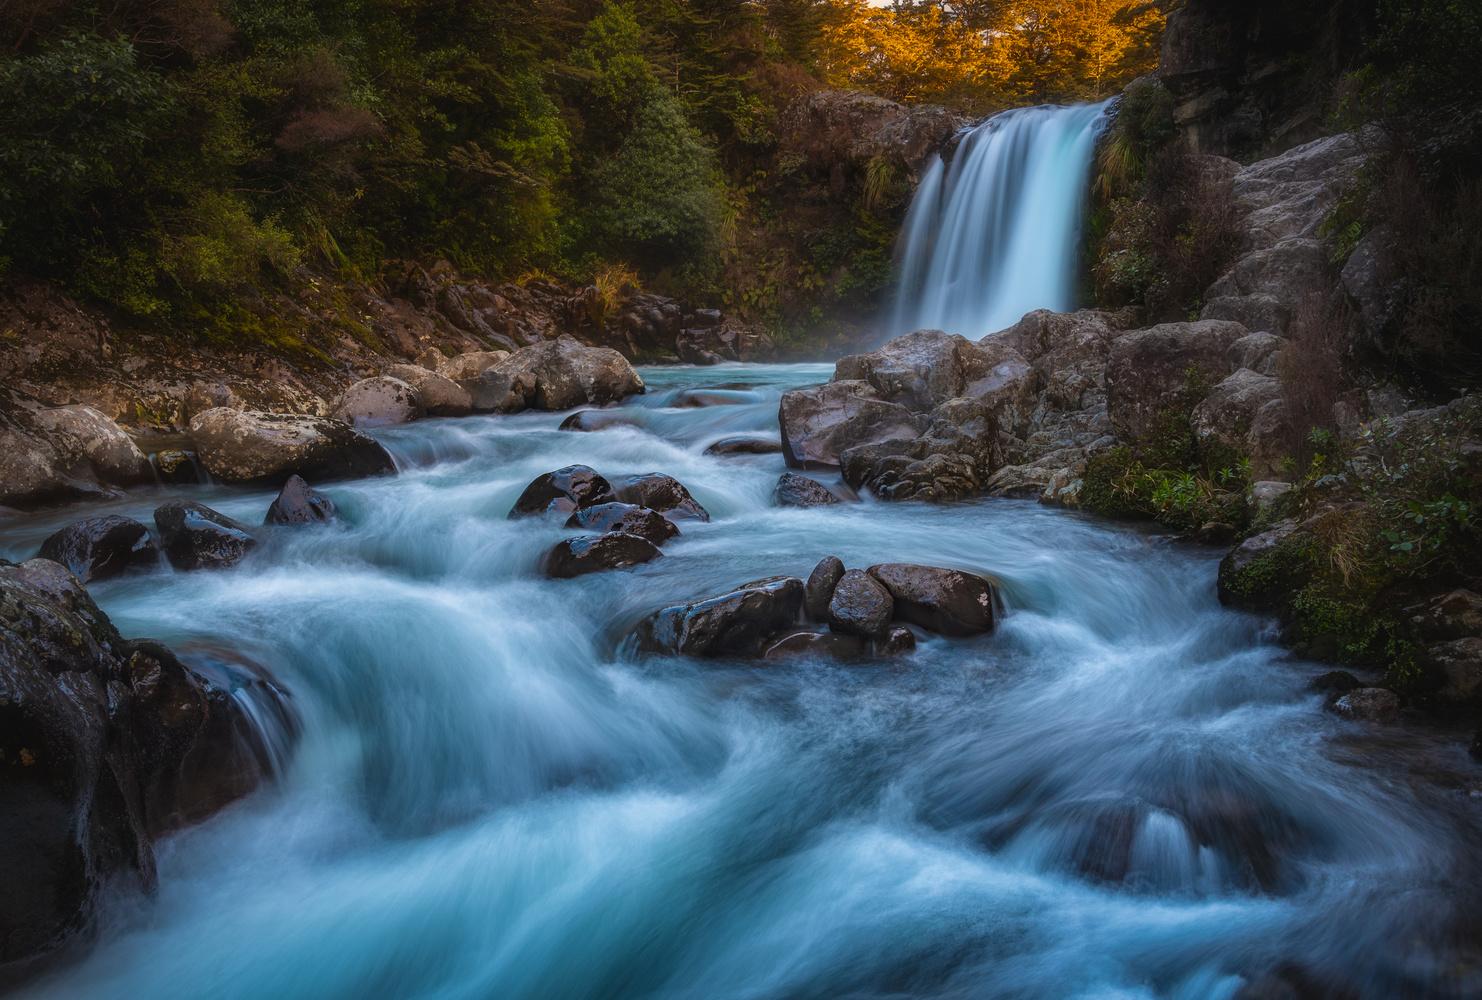 Gollum's Pool (Tawhai Falls) by Chris Wain